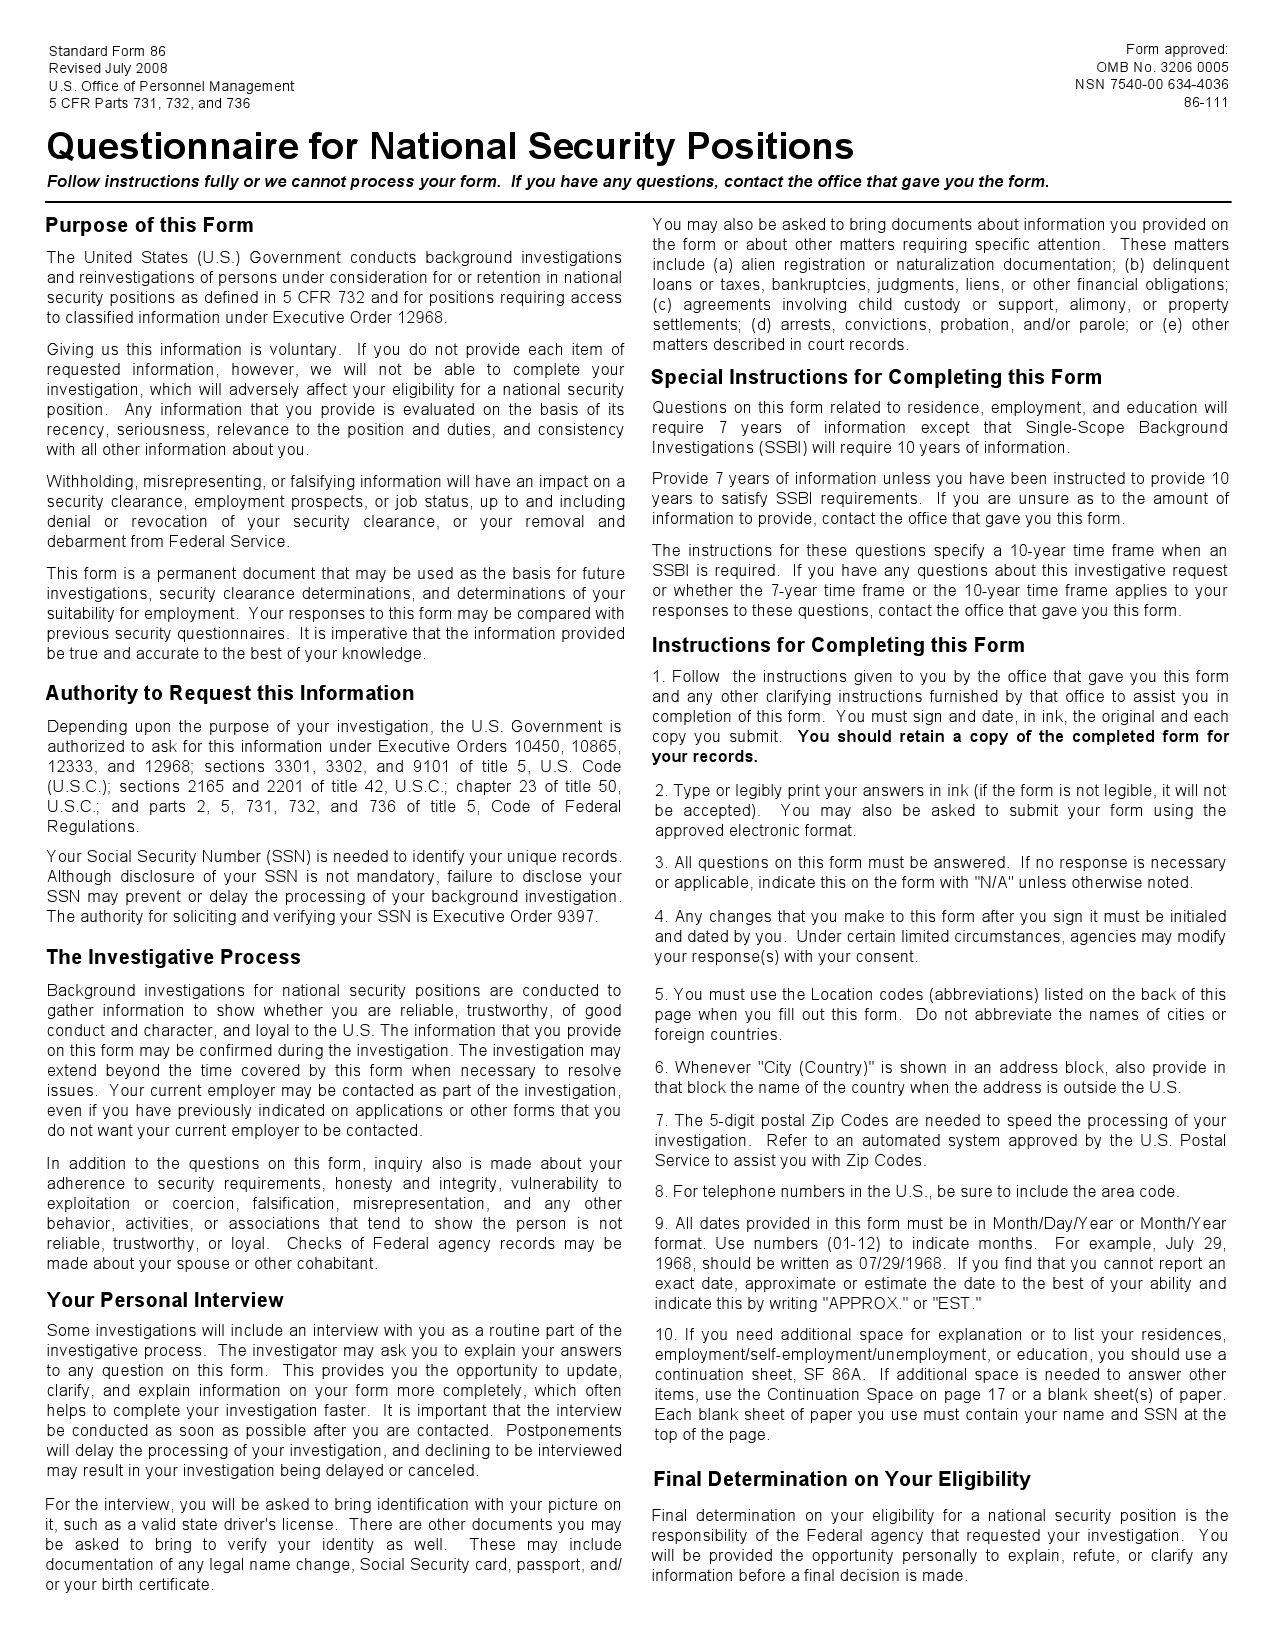 SF 86 JULY 2008 EBOOK